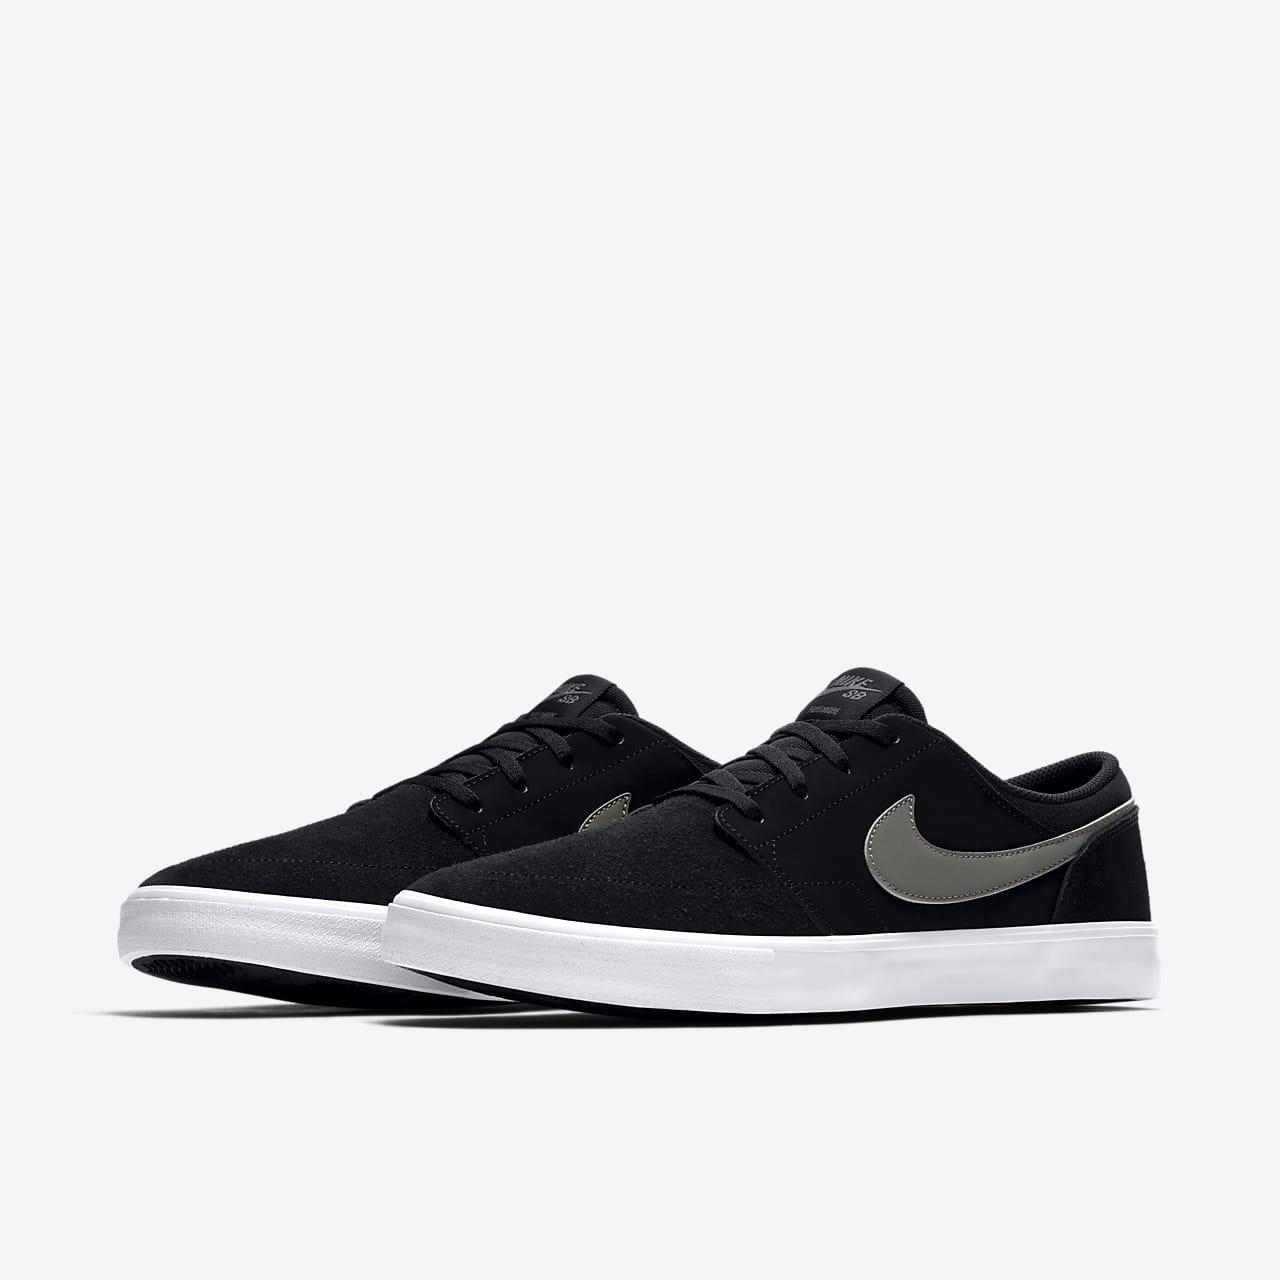 nike sb solarsoft portmore ii men's skate shoes off 66 ...